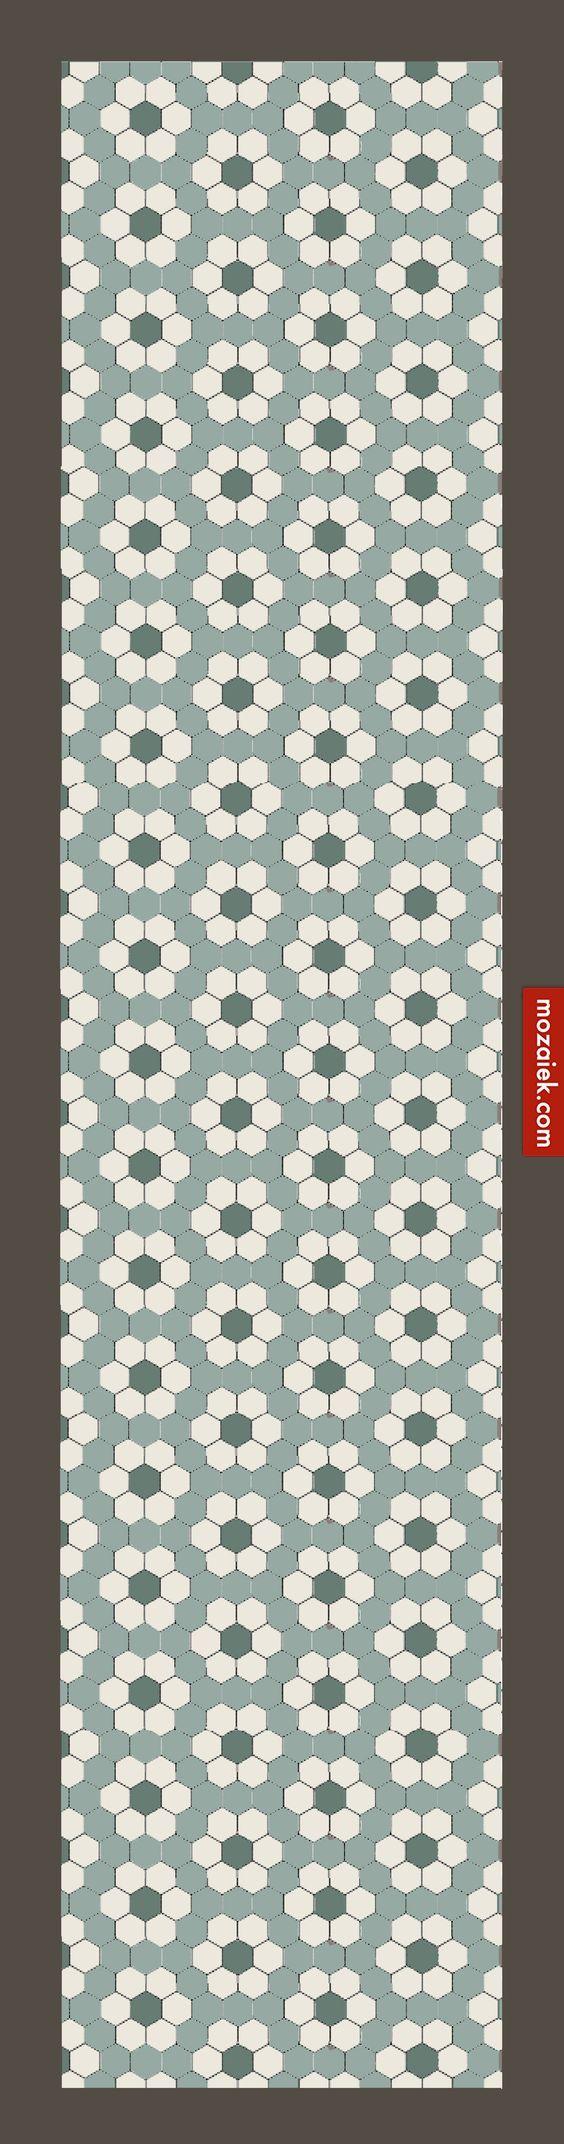 hexagonlove_dubbelhardegebakken_vloertegels